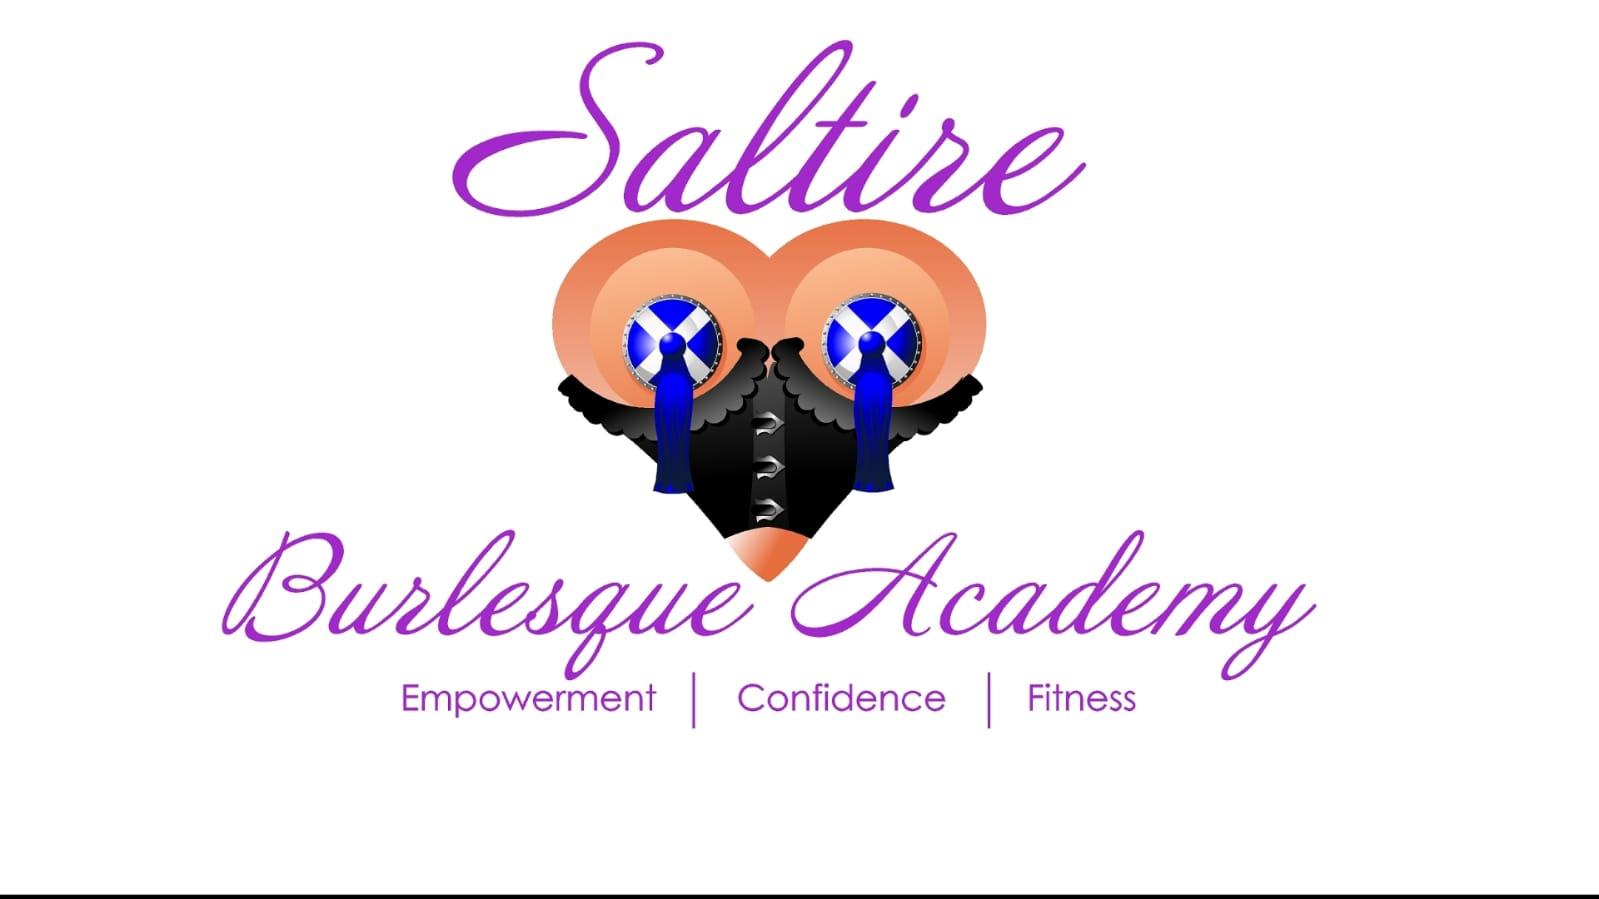 Saltire Burlesque Academy